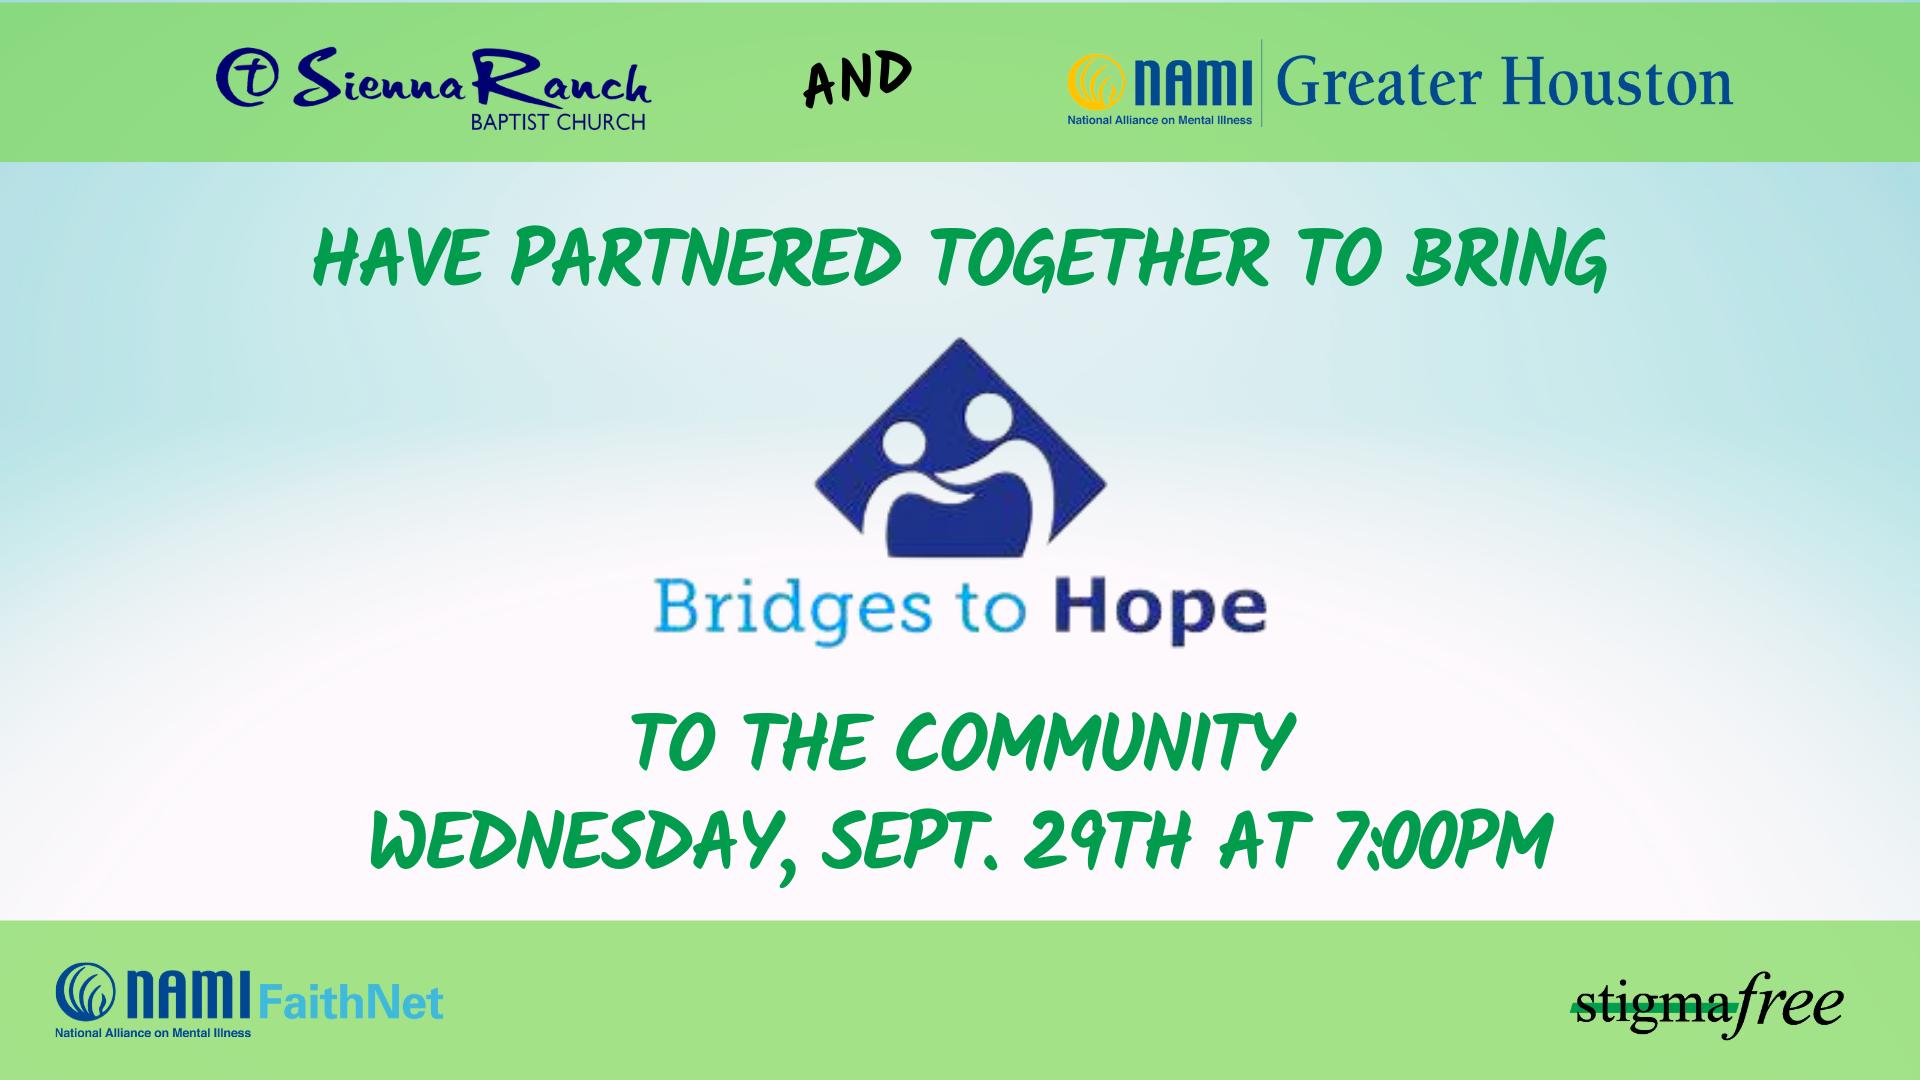 Bridges to Hope